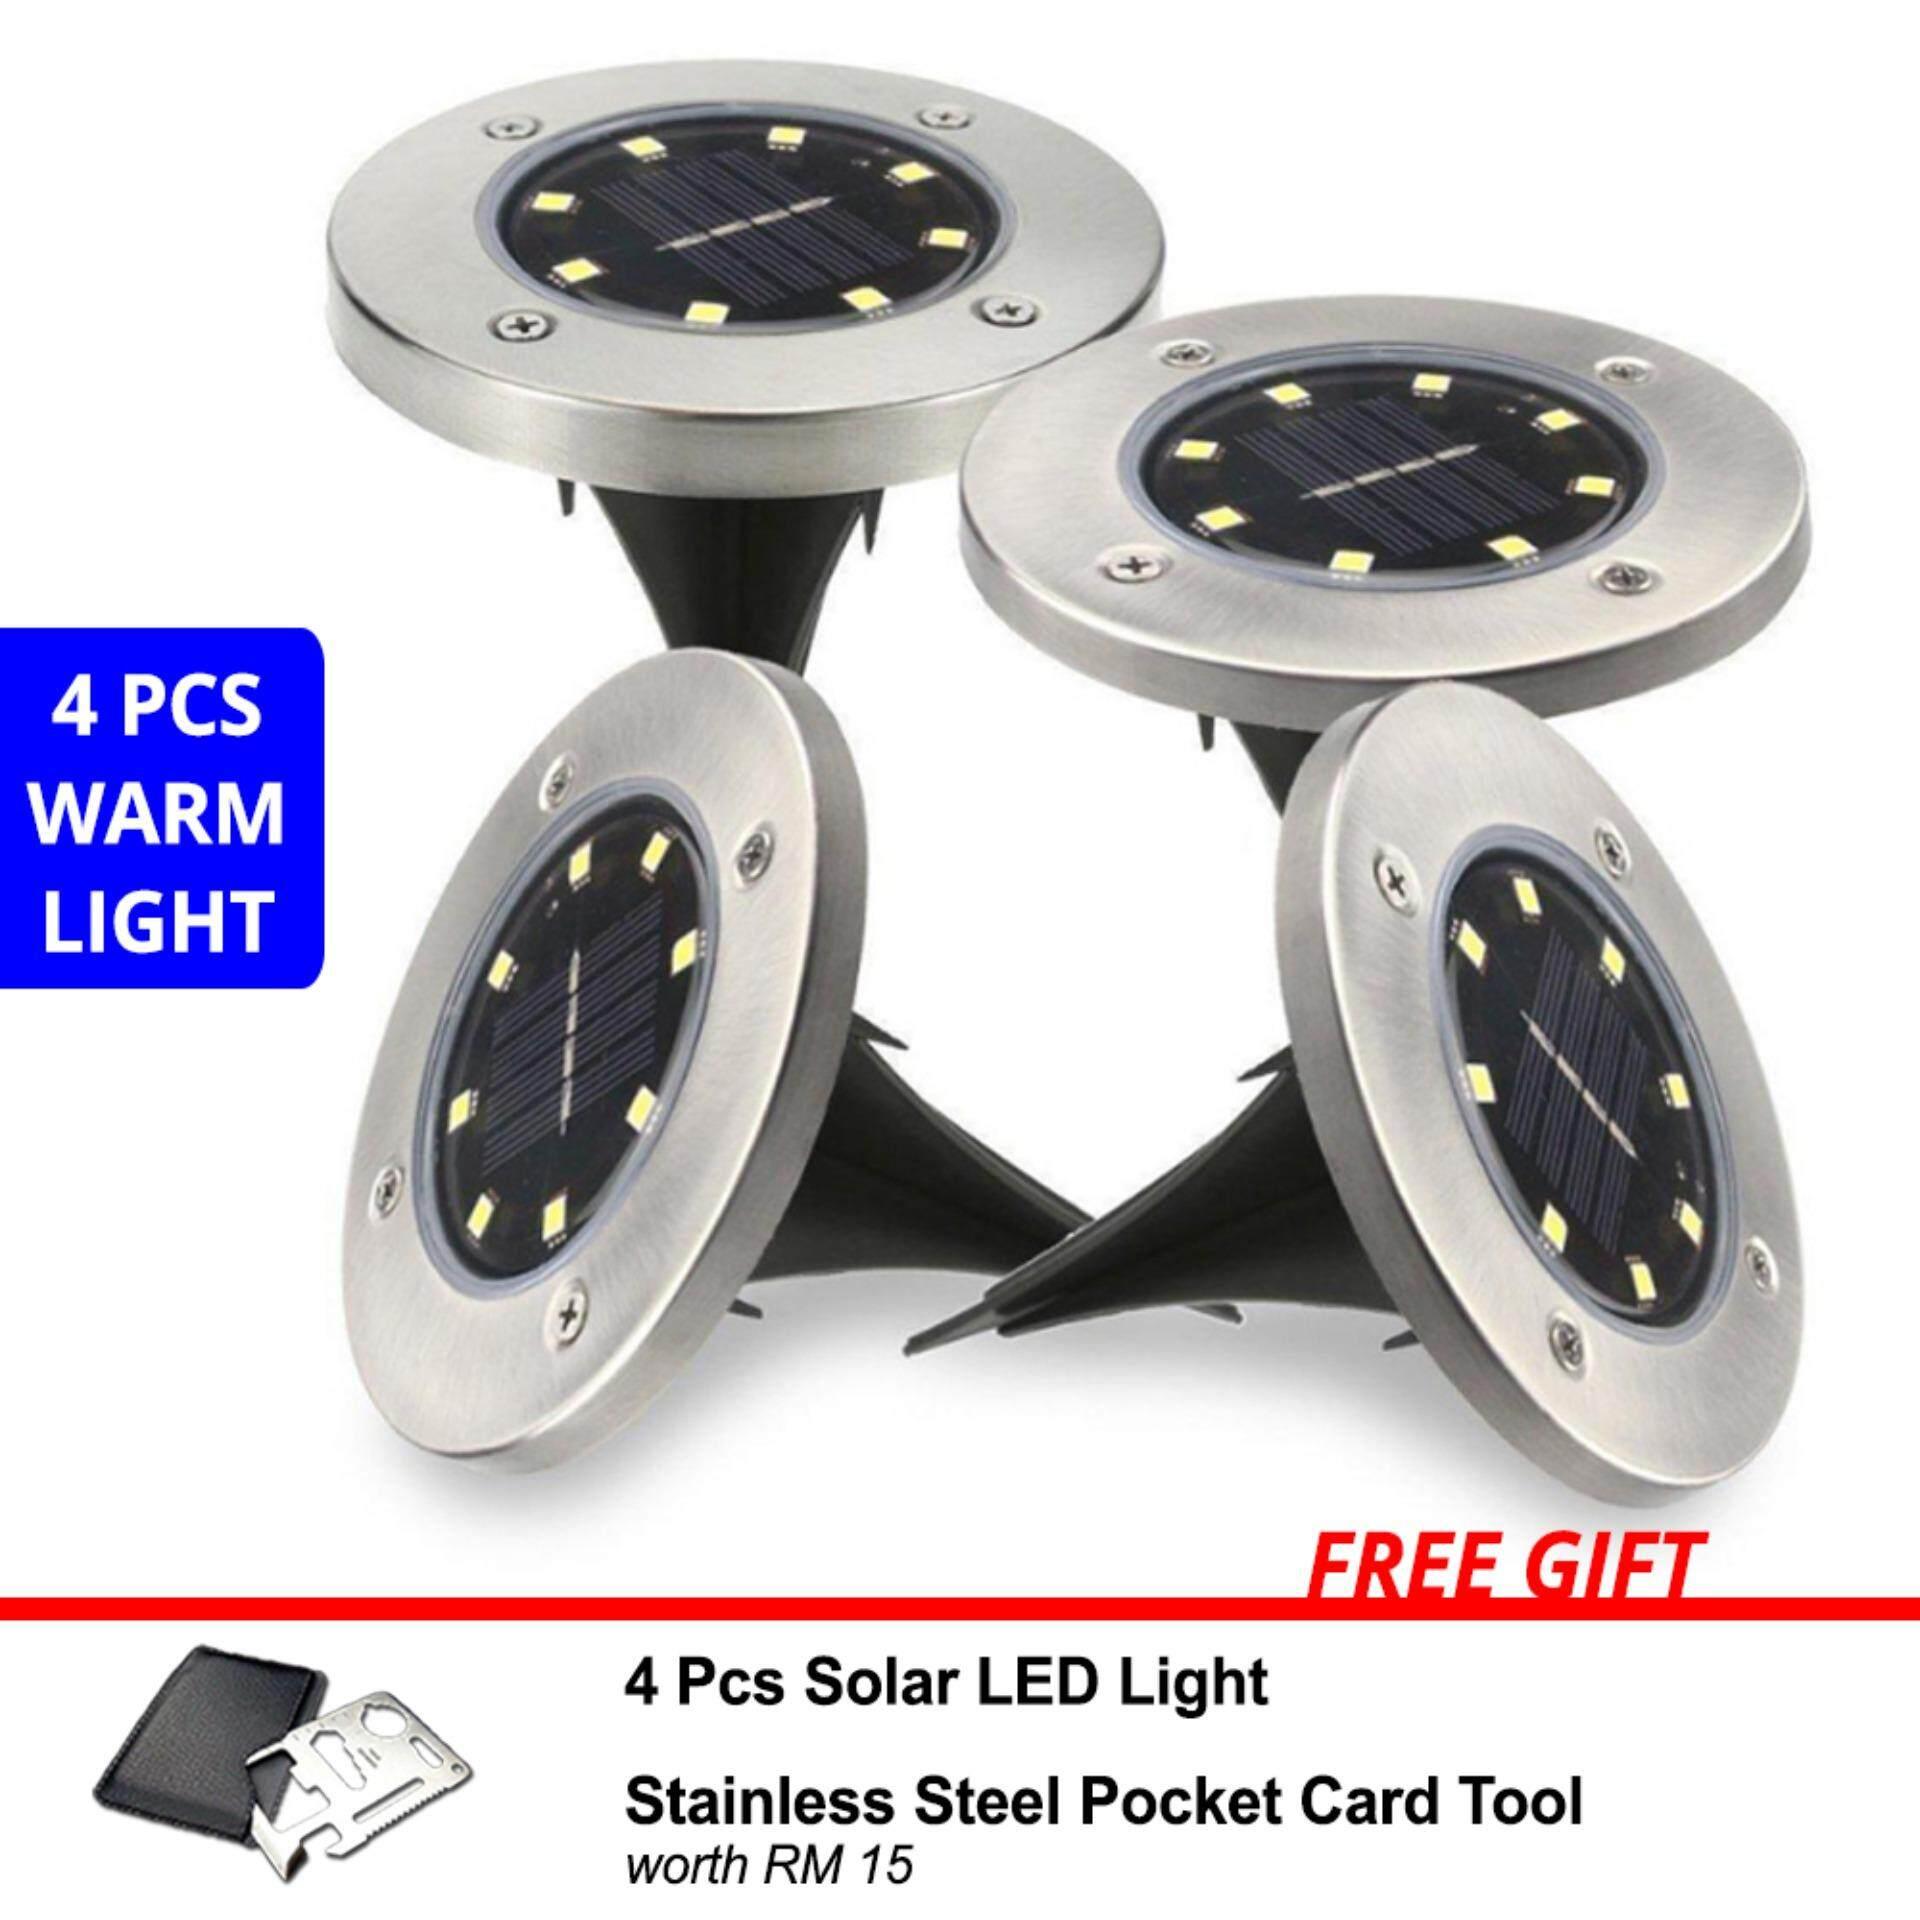 4 Pcs Solar LED Garden Outdoor Lighting Bright Light Waterproof Night Auto On Floor Light